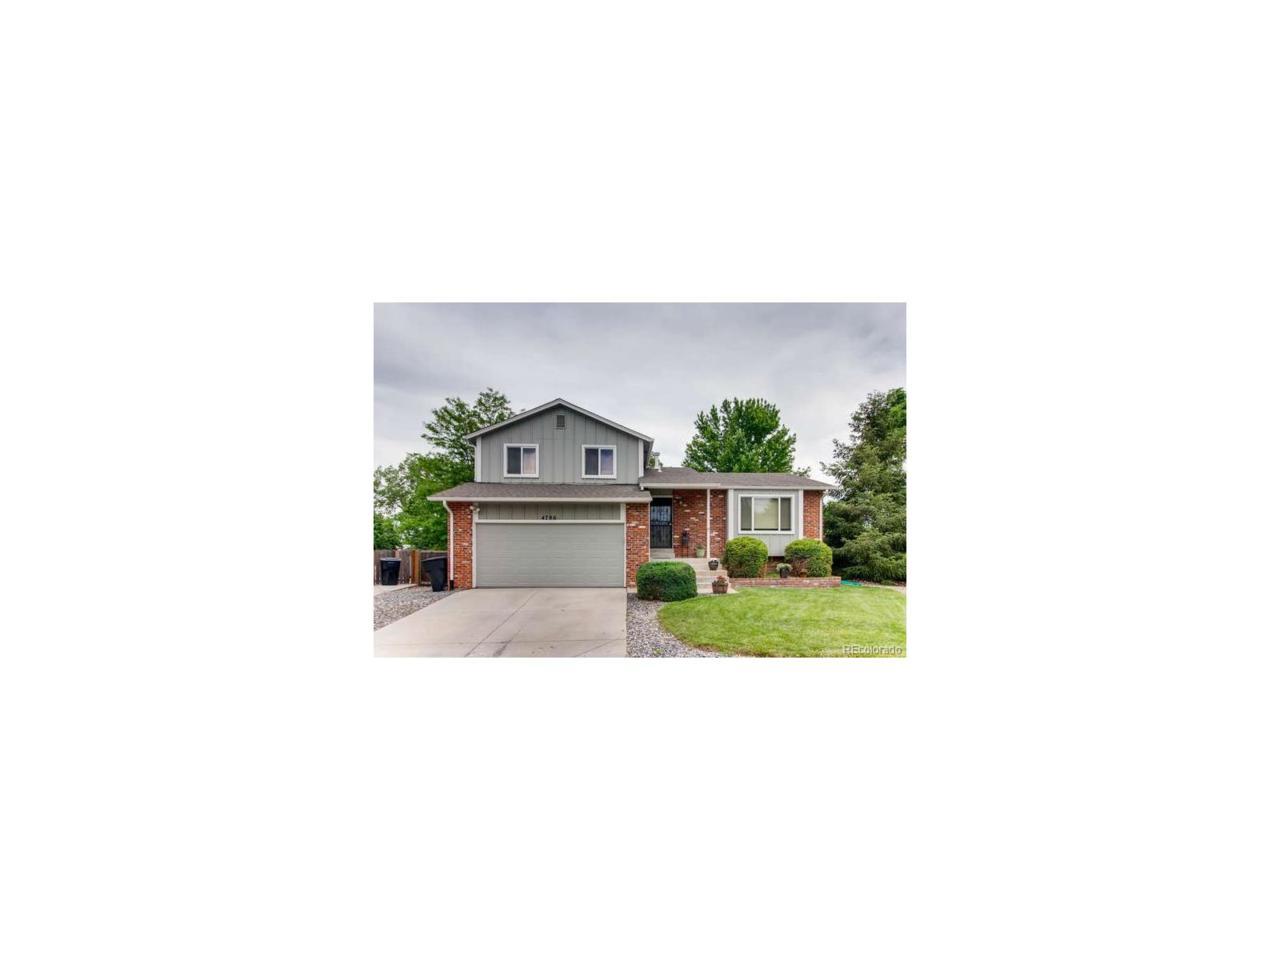 4786 S Gar Way, Littleton, CO 80123 (MLS #2055160) :: 8z Real Estate